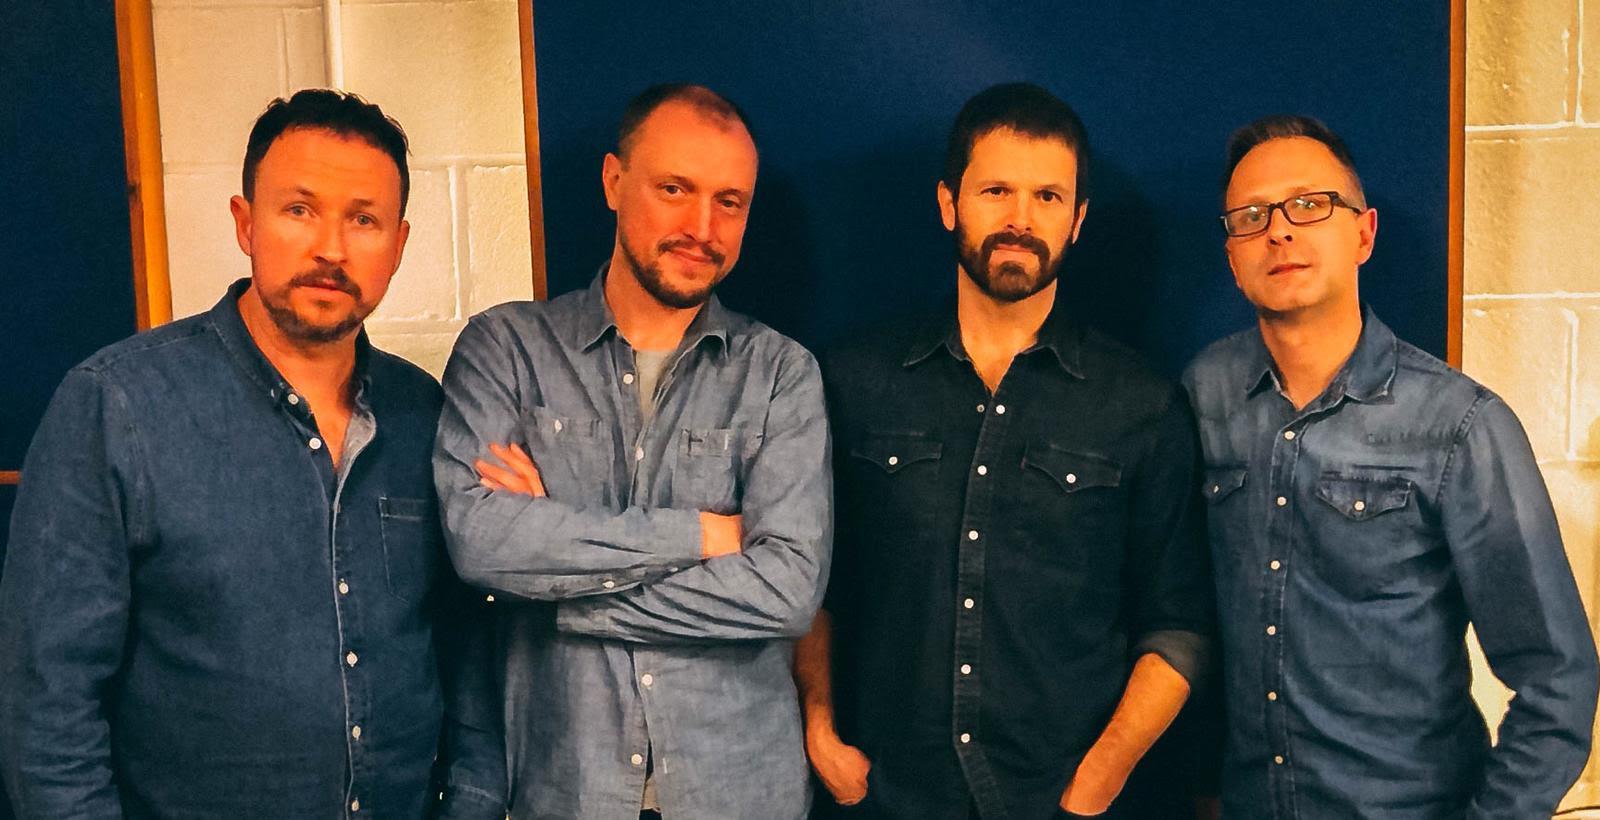 UK Rock band Sonny Jim